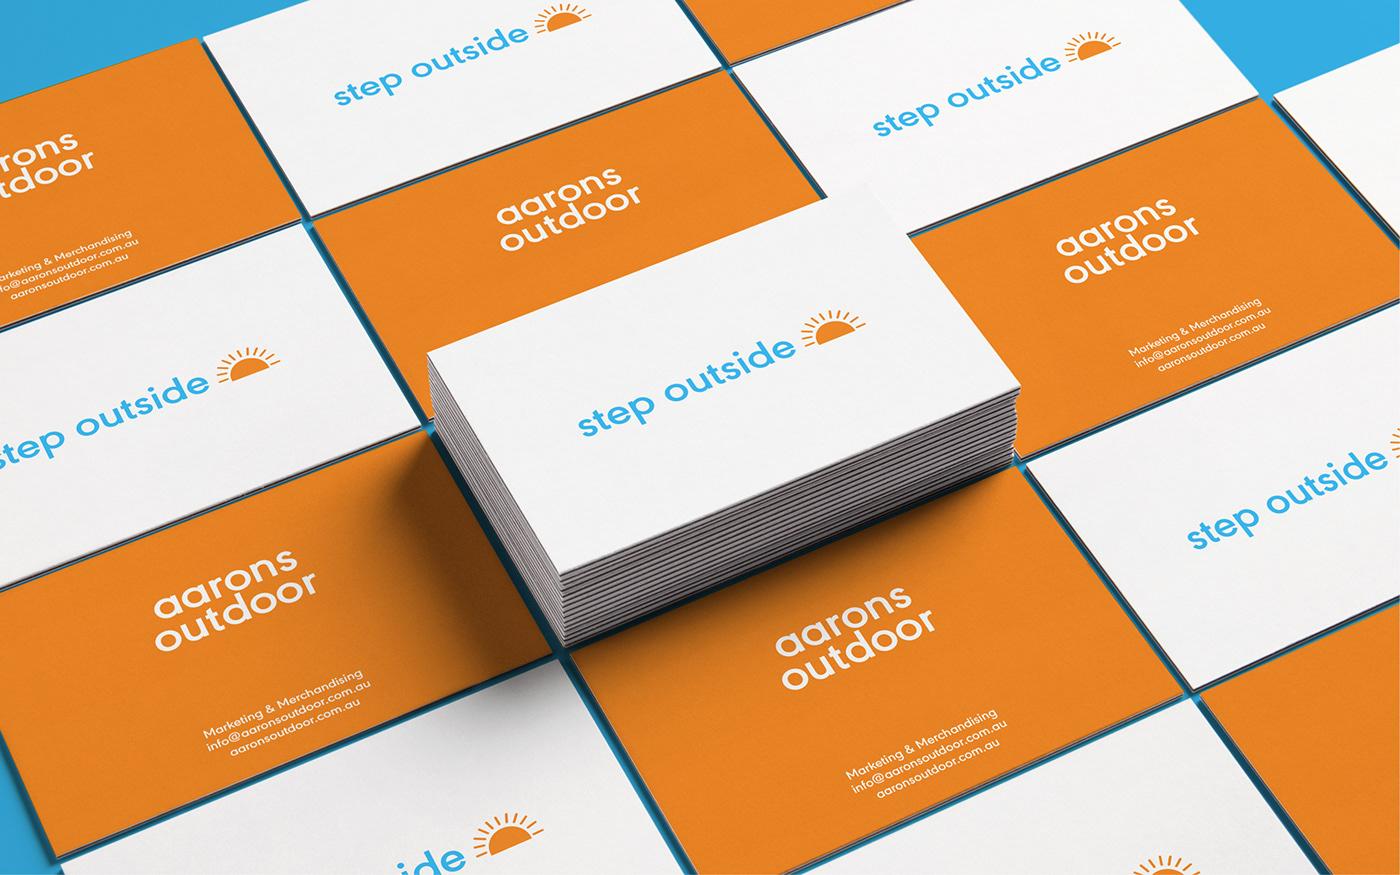 branding  Creative Direction  styling  Web Design  art direction  graphic design  Logo Design Photography  studio